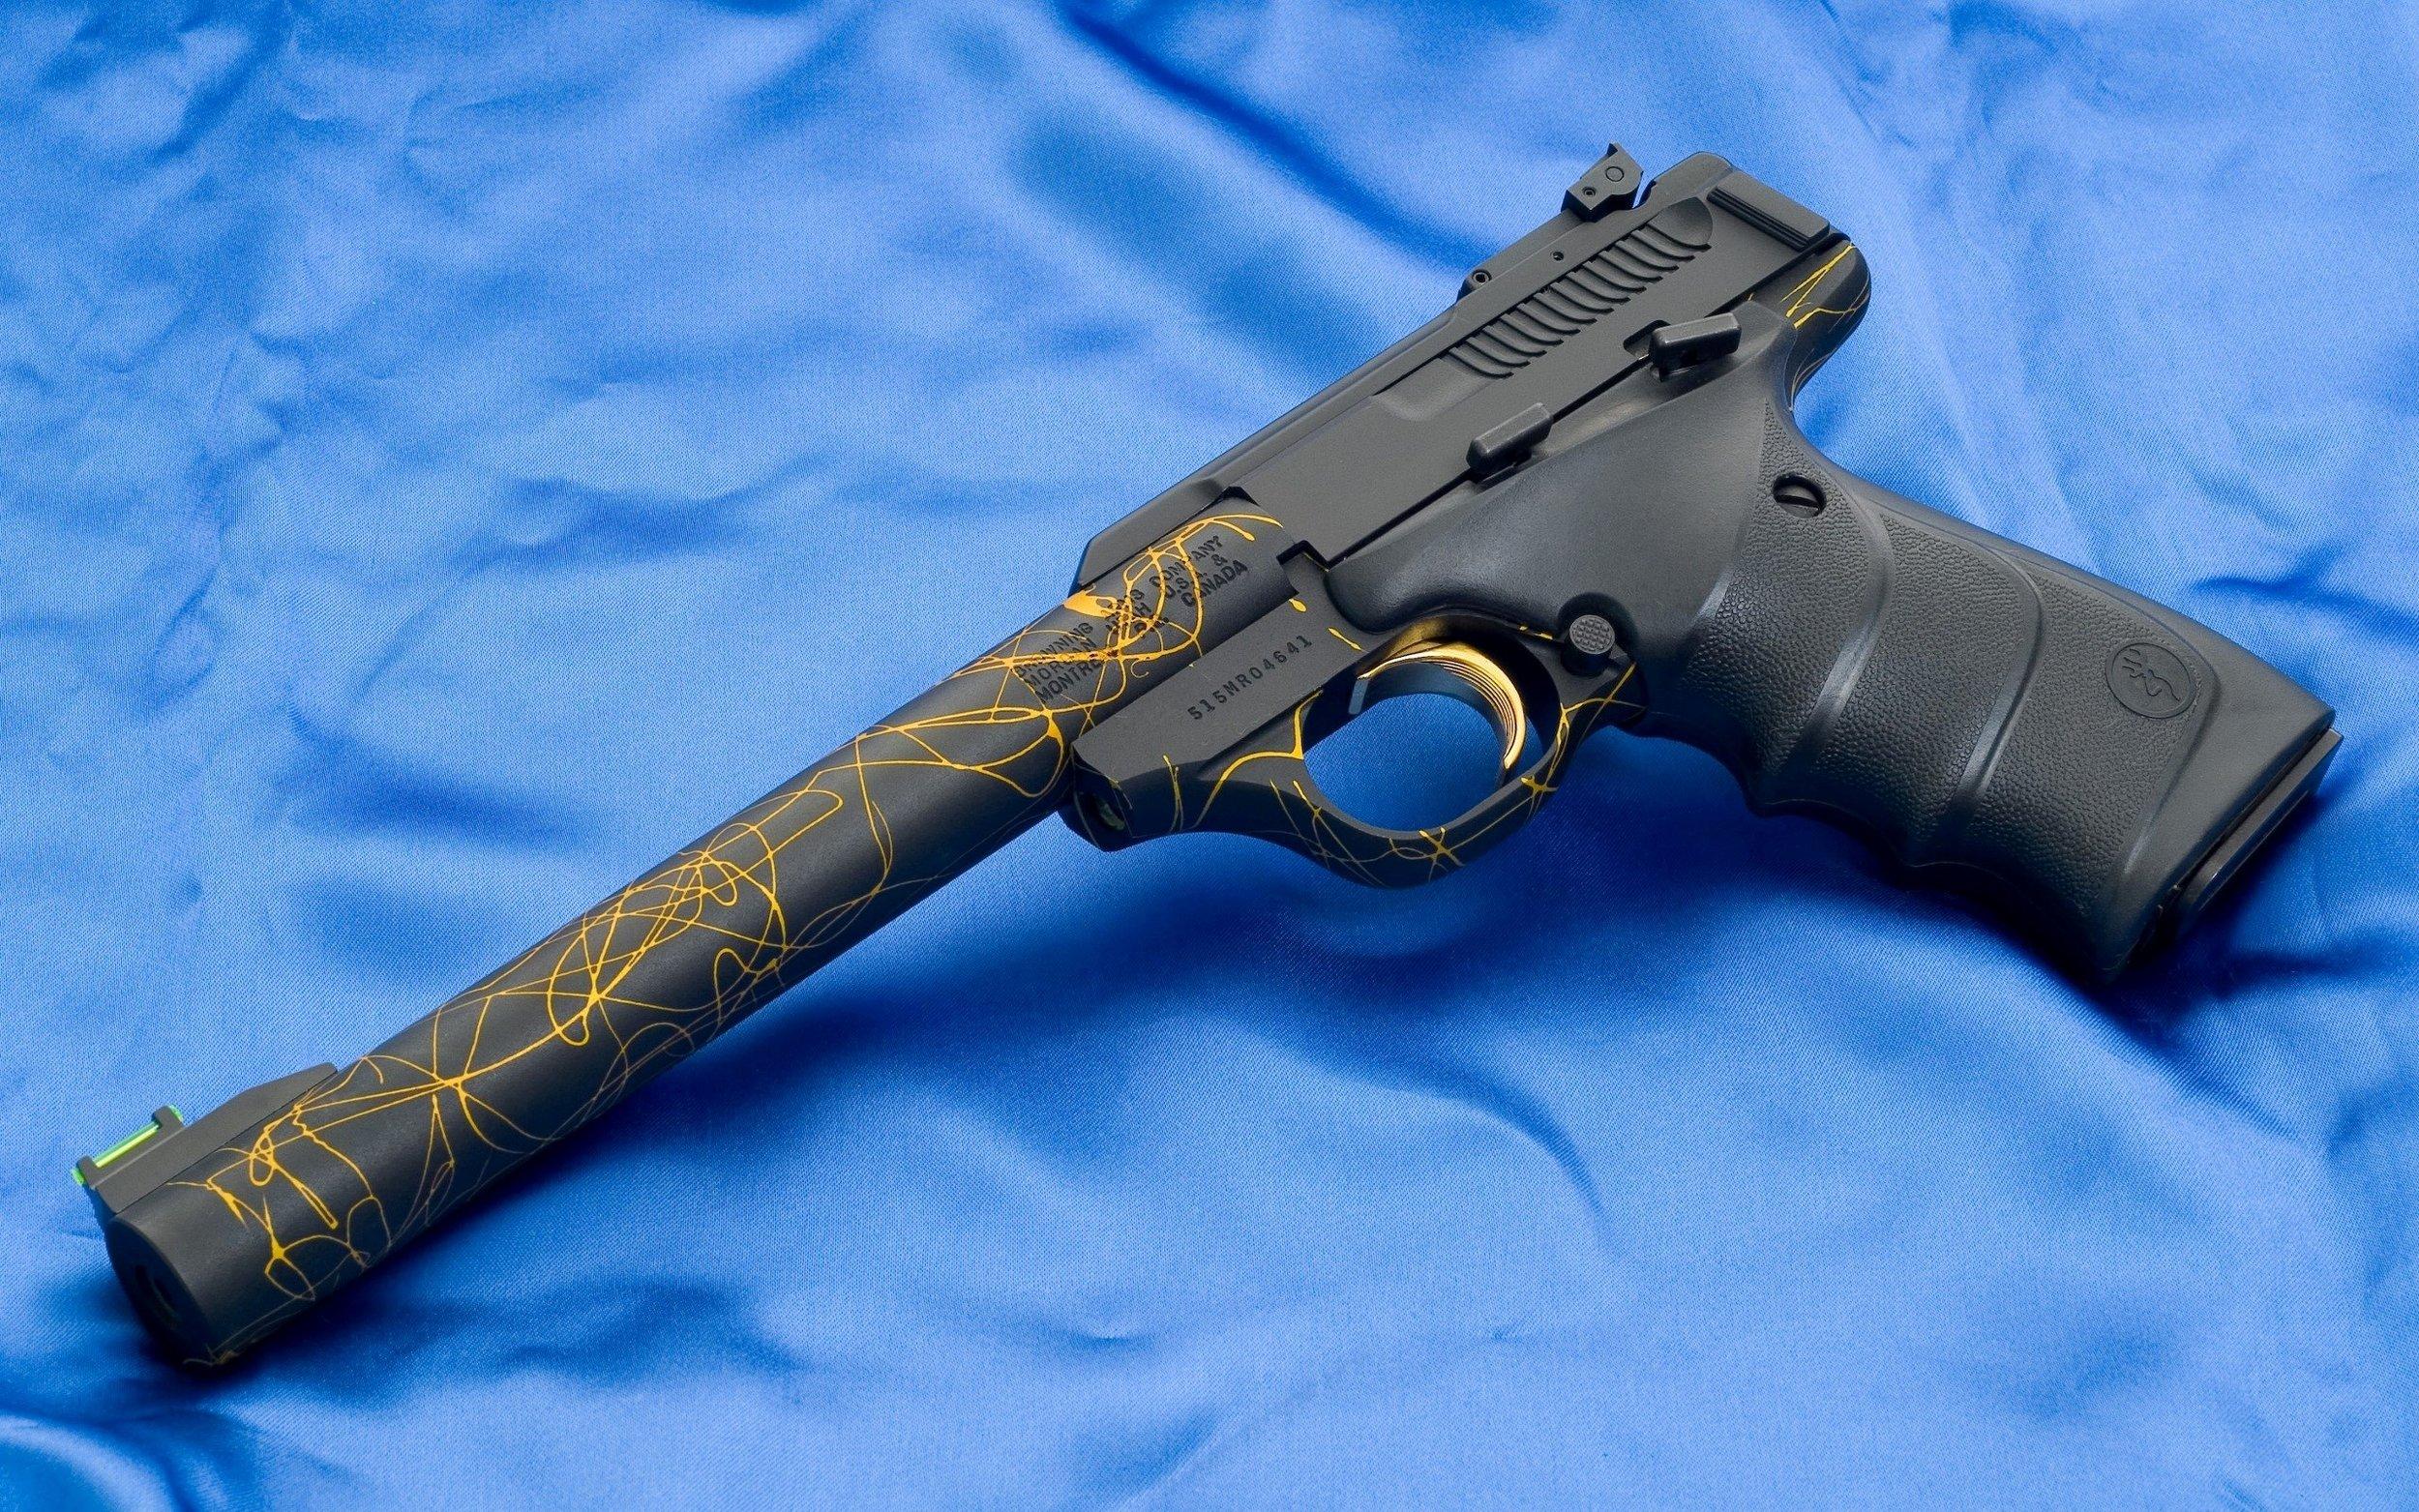 Weapon_Browning_Buckmark_Gun_HD_Images.jpg